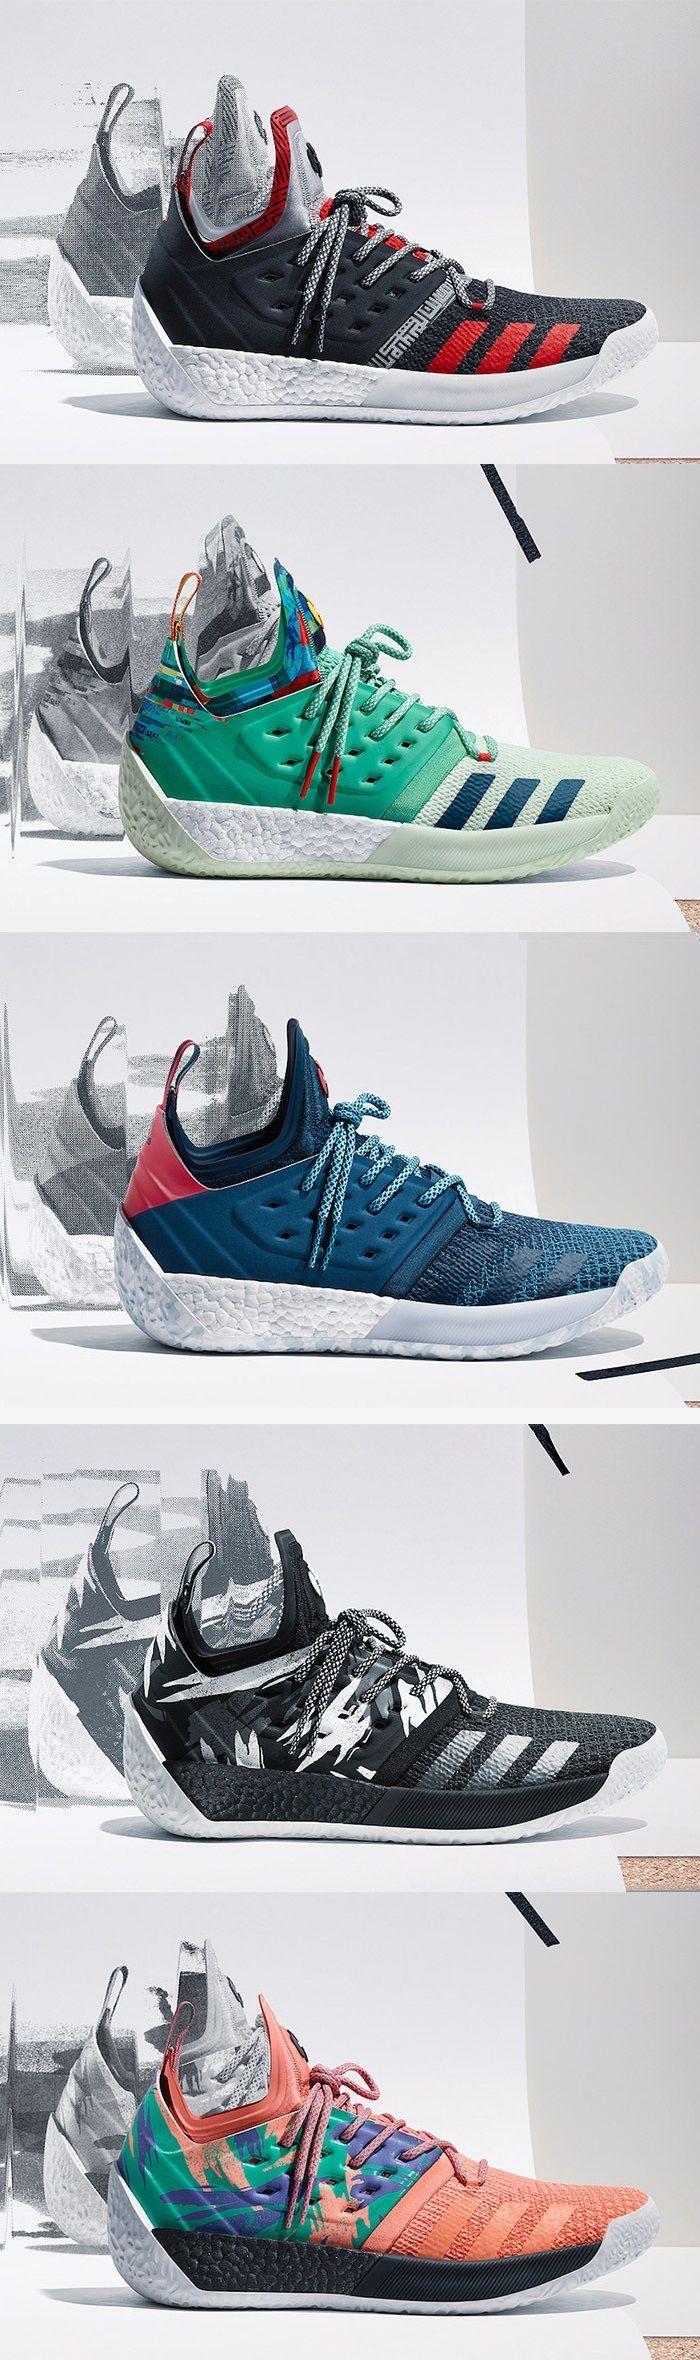 Adidas Zapatillas de baloncesto Harden 2 sneakersadidas Pinterest